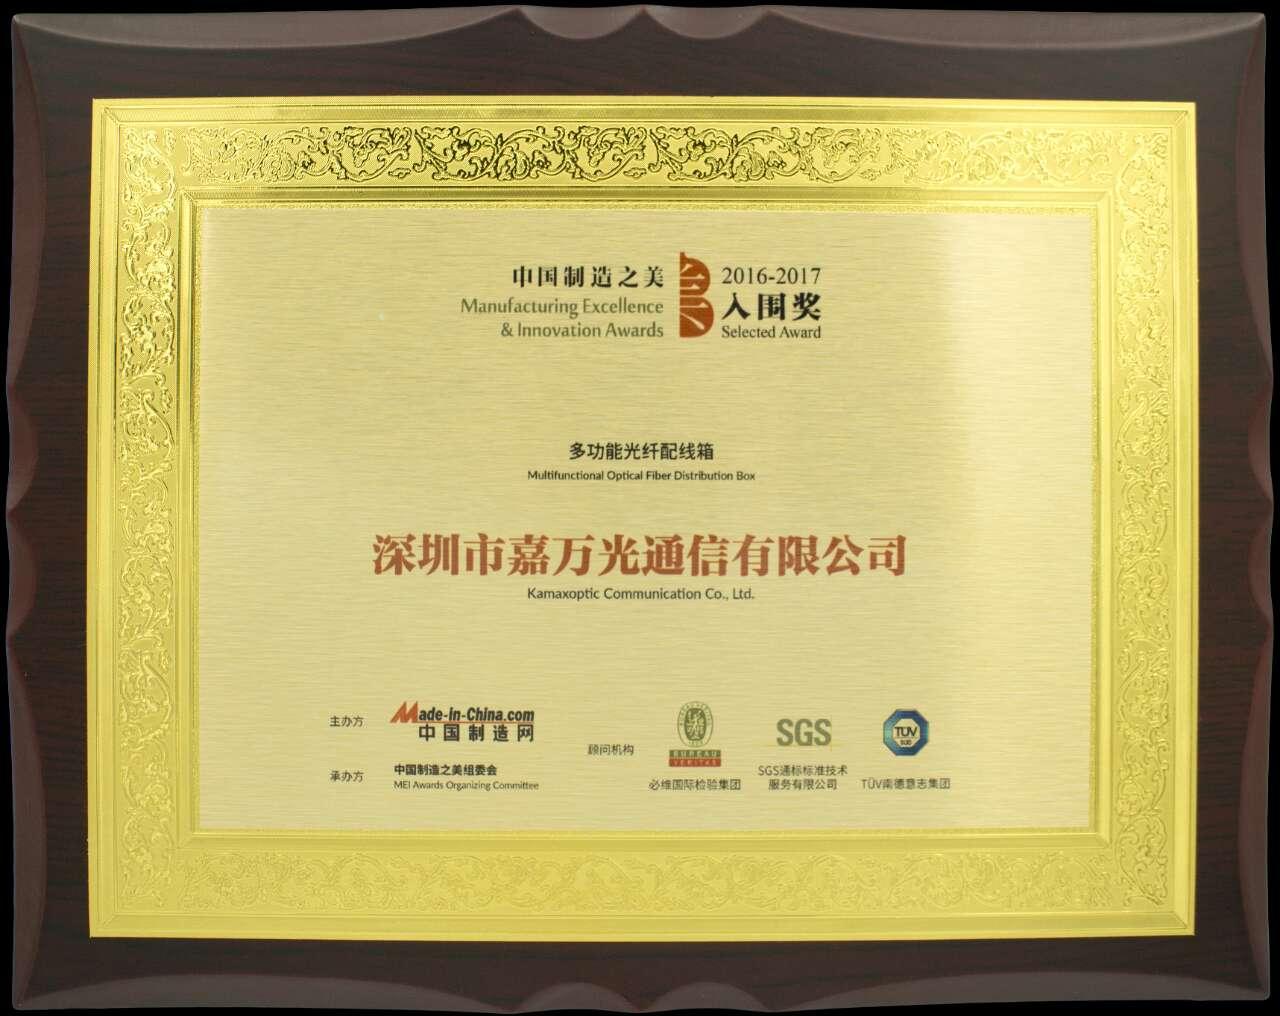 Selected Award